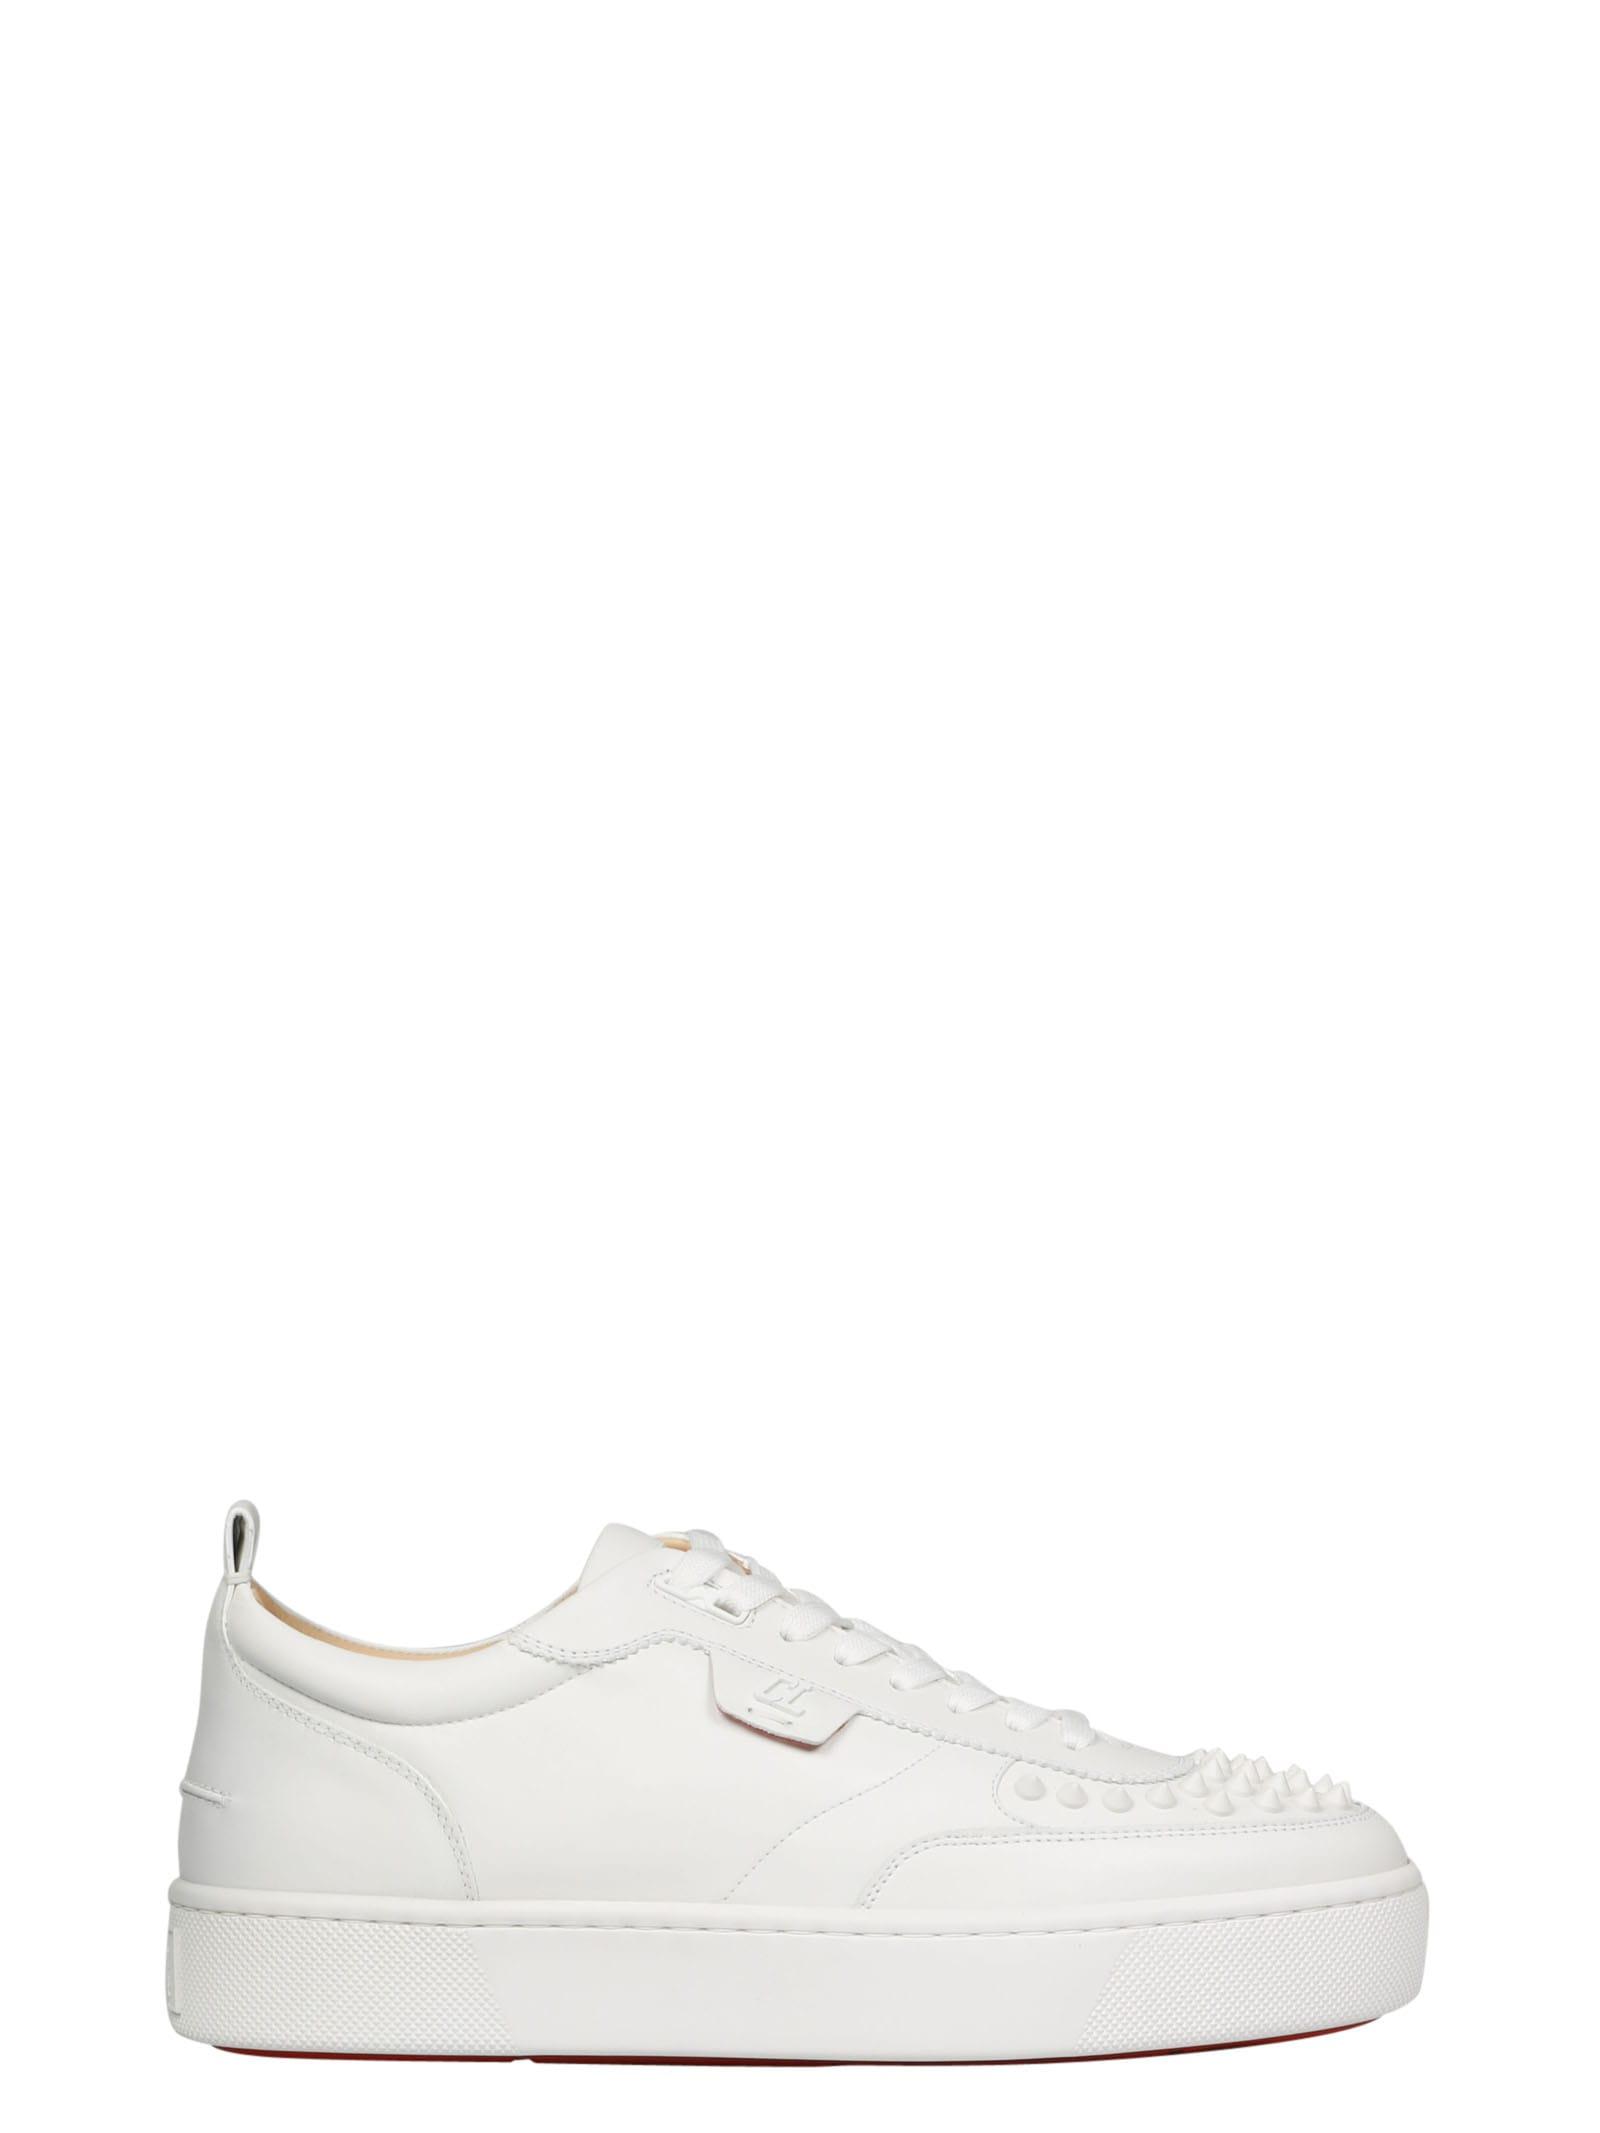 louboutin shoes white